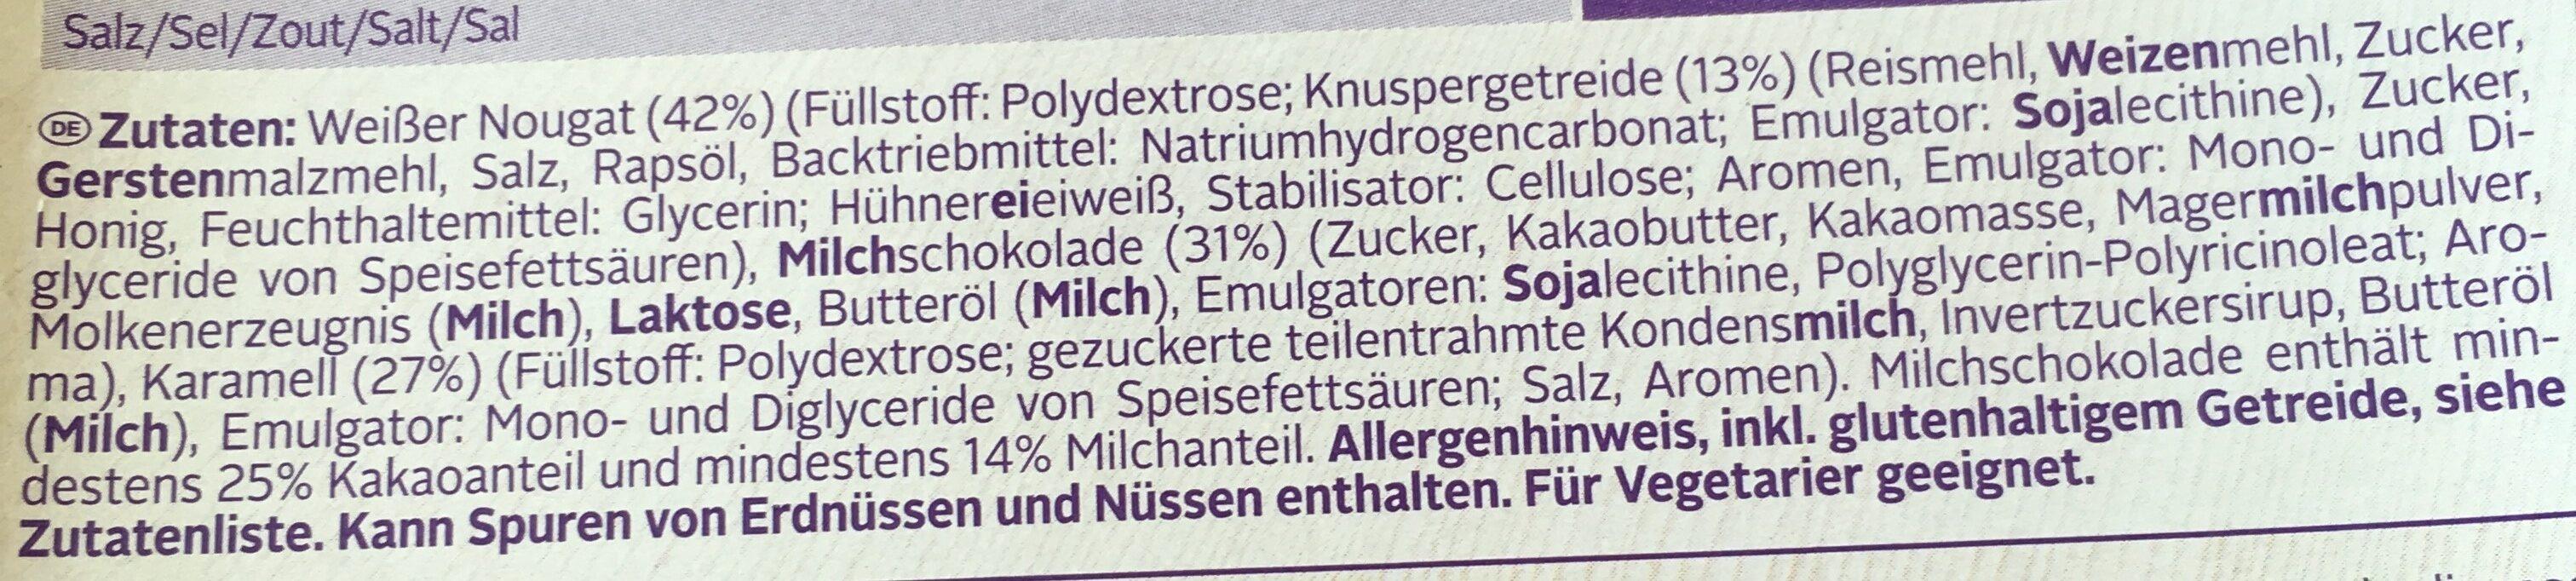 Weight Watchers Riegel Rich Toffee - Ingrediënten - de